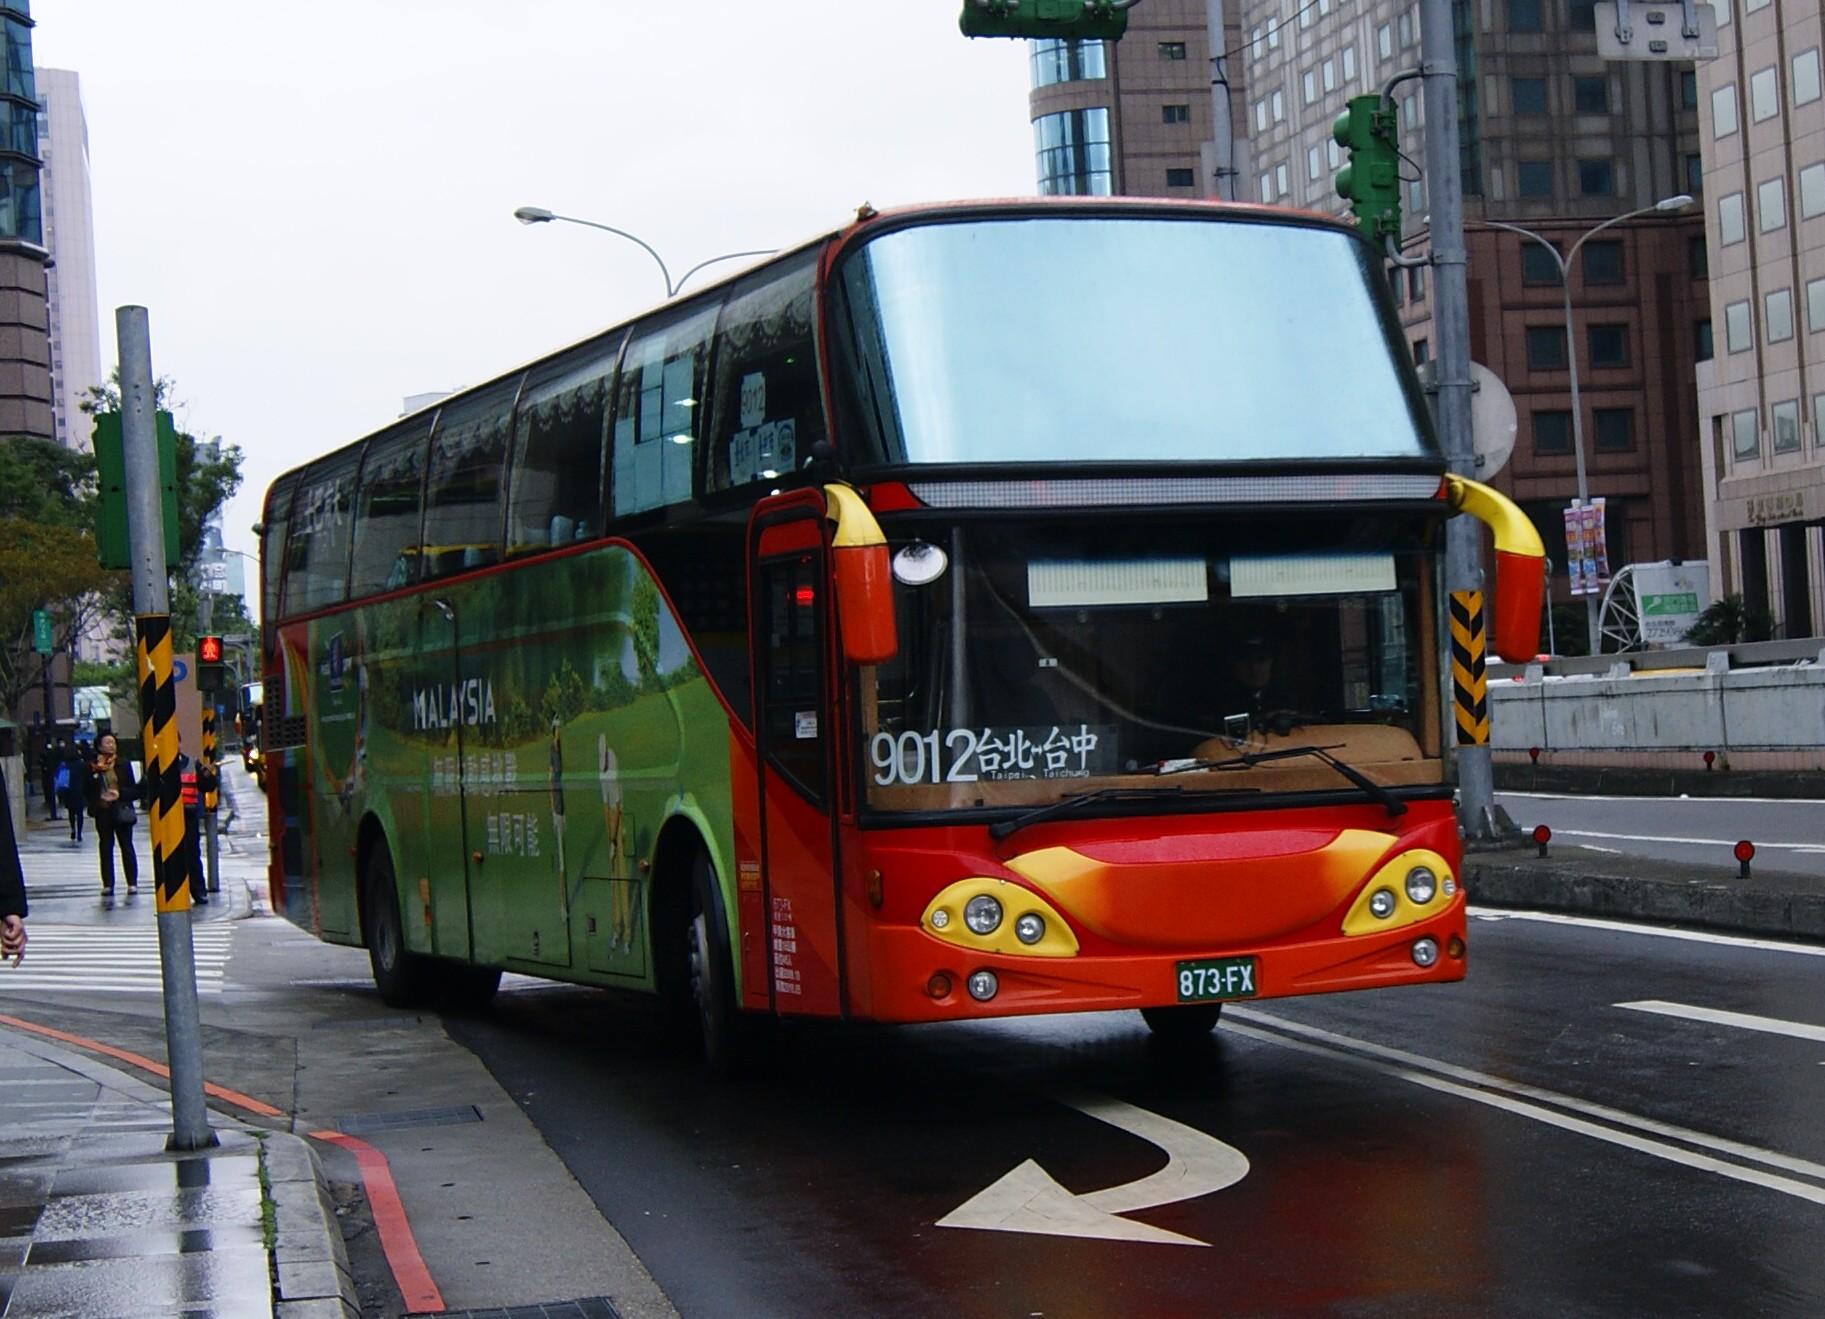 File:大有巴士 大吉車體873-FX 9012.jpg - Wikimedia Commons